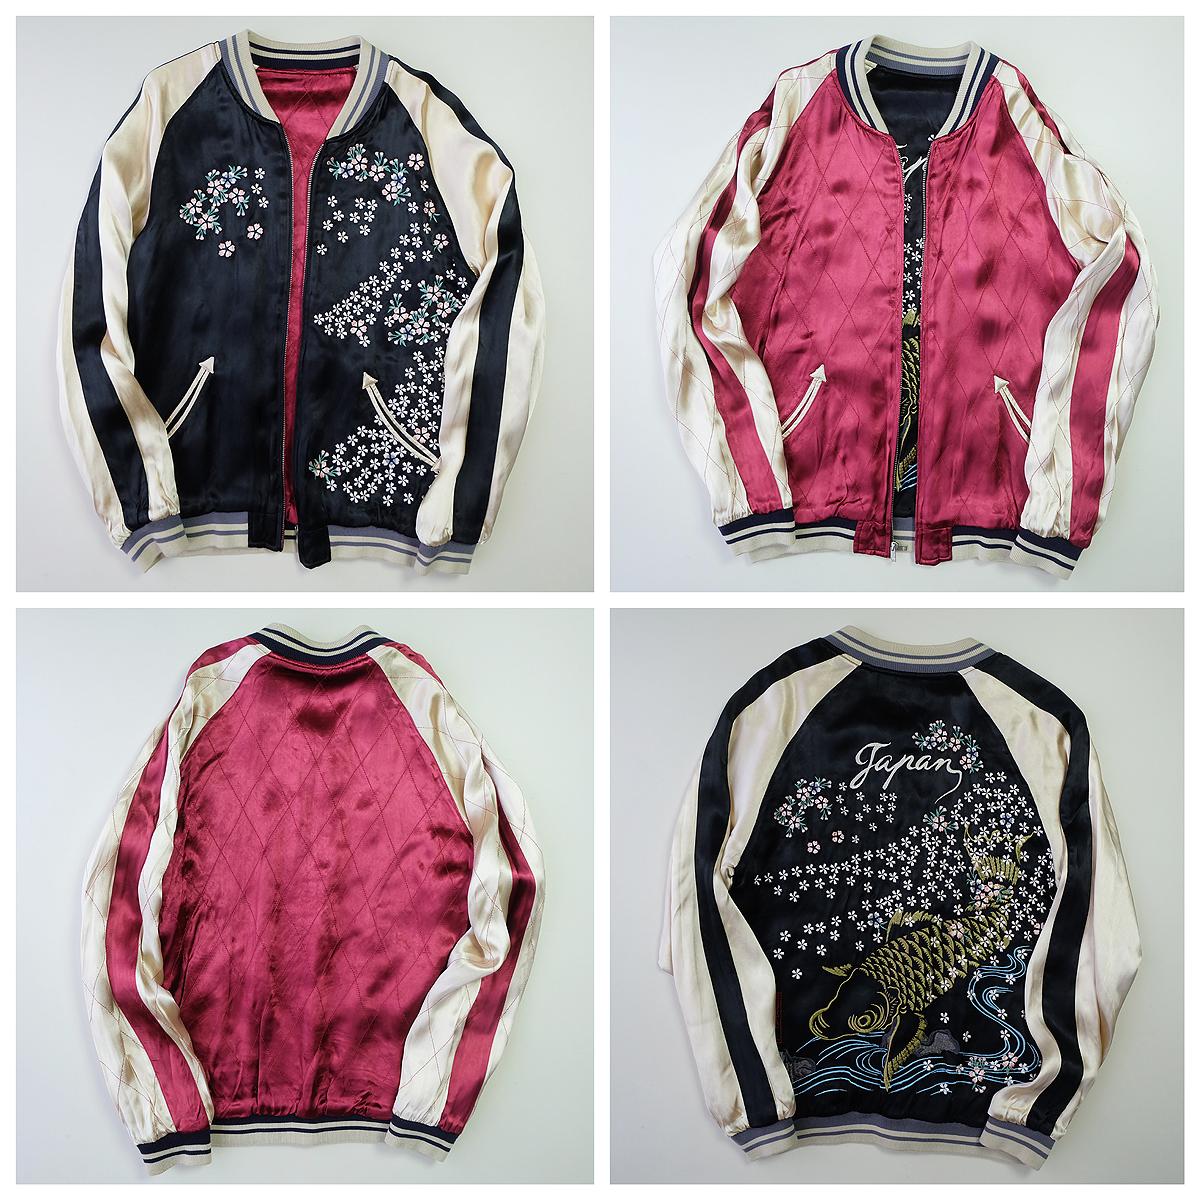 Vintage Japan Iolani Sakura Cherry Blossoms Koi Fish Elegant Embroidery Sukajan Souvenir Jacket - Japan Lover Me Store